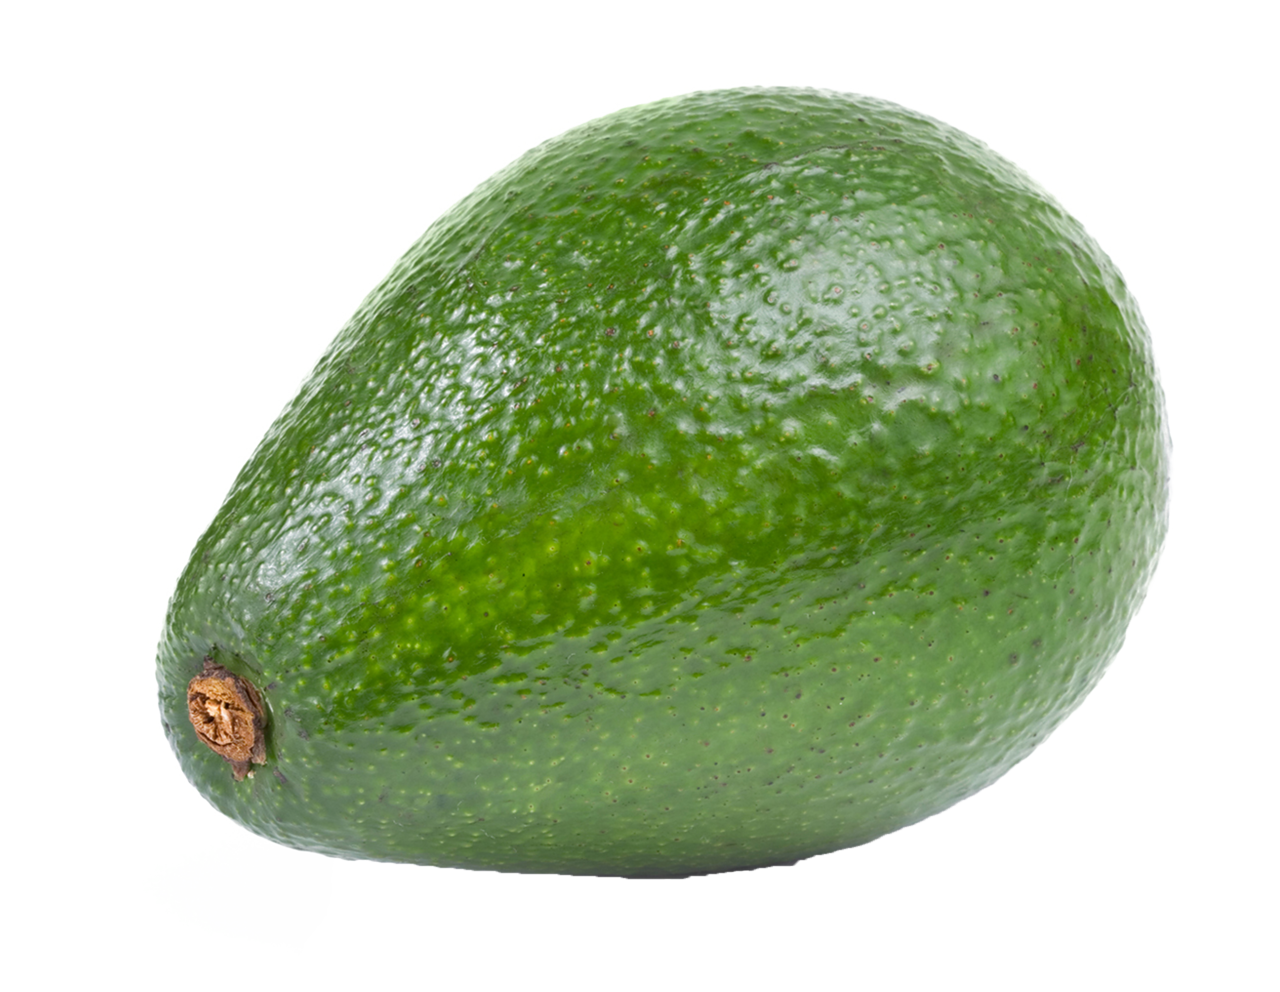 Avocado PNG - 18156